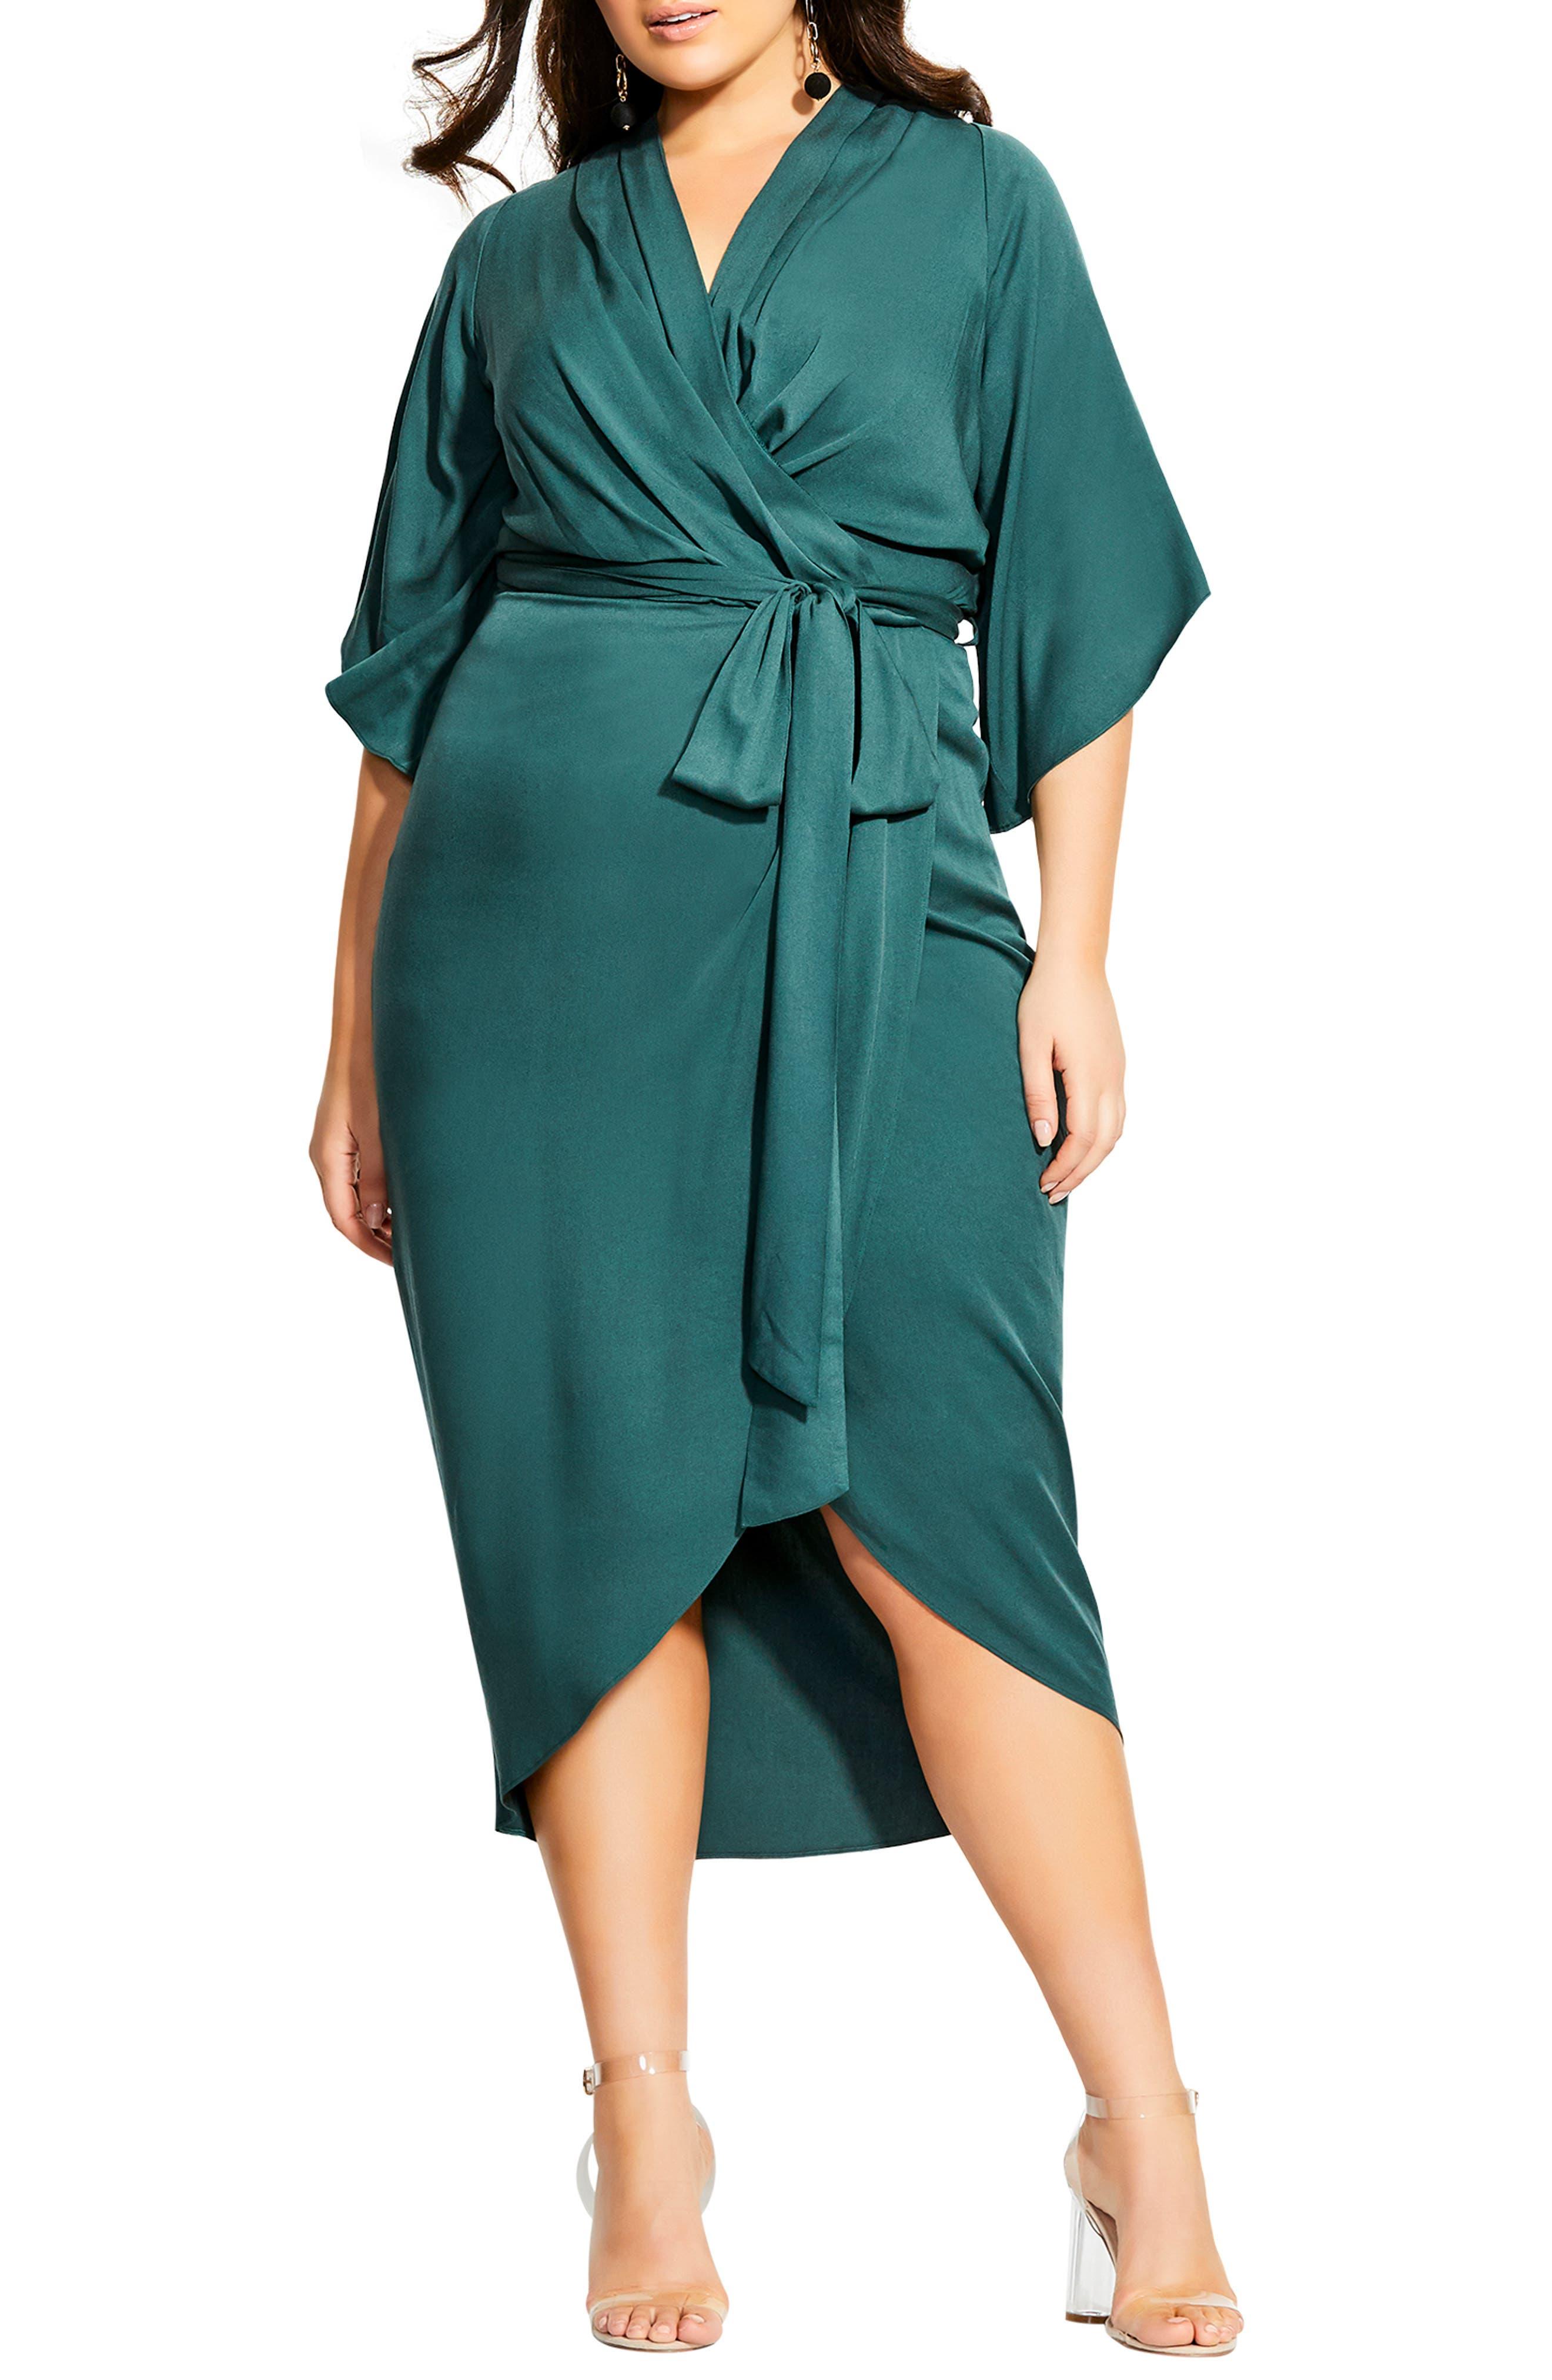 70s Dresses – Disco Dress, Hippie Dress, Wrap Dress Plus Size Womens City Chic Faux Wrap Dress Size X-Small - Green $109.00 AT vintagedancer.com